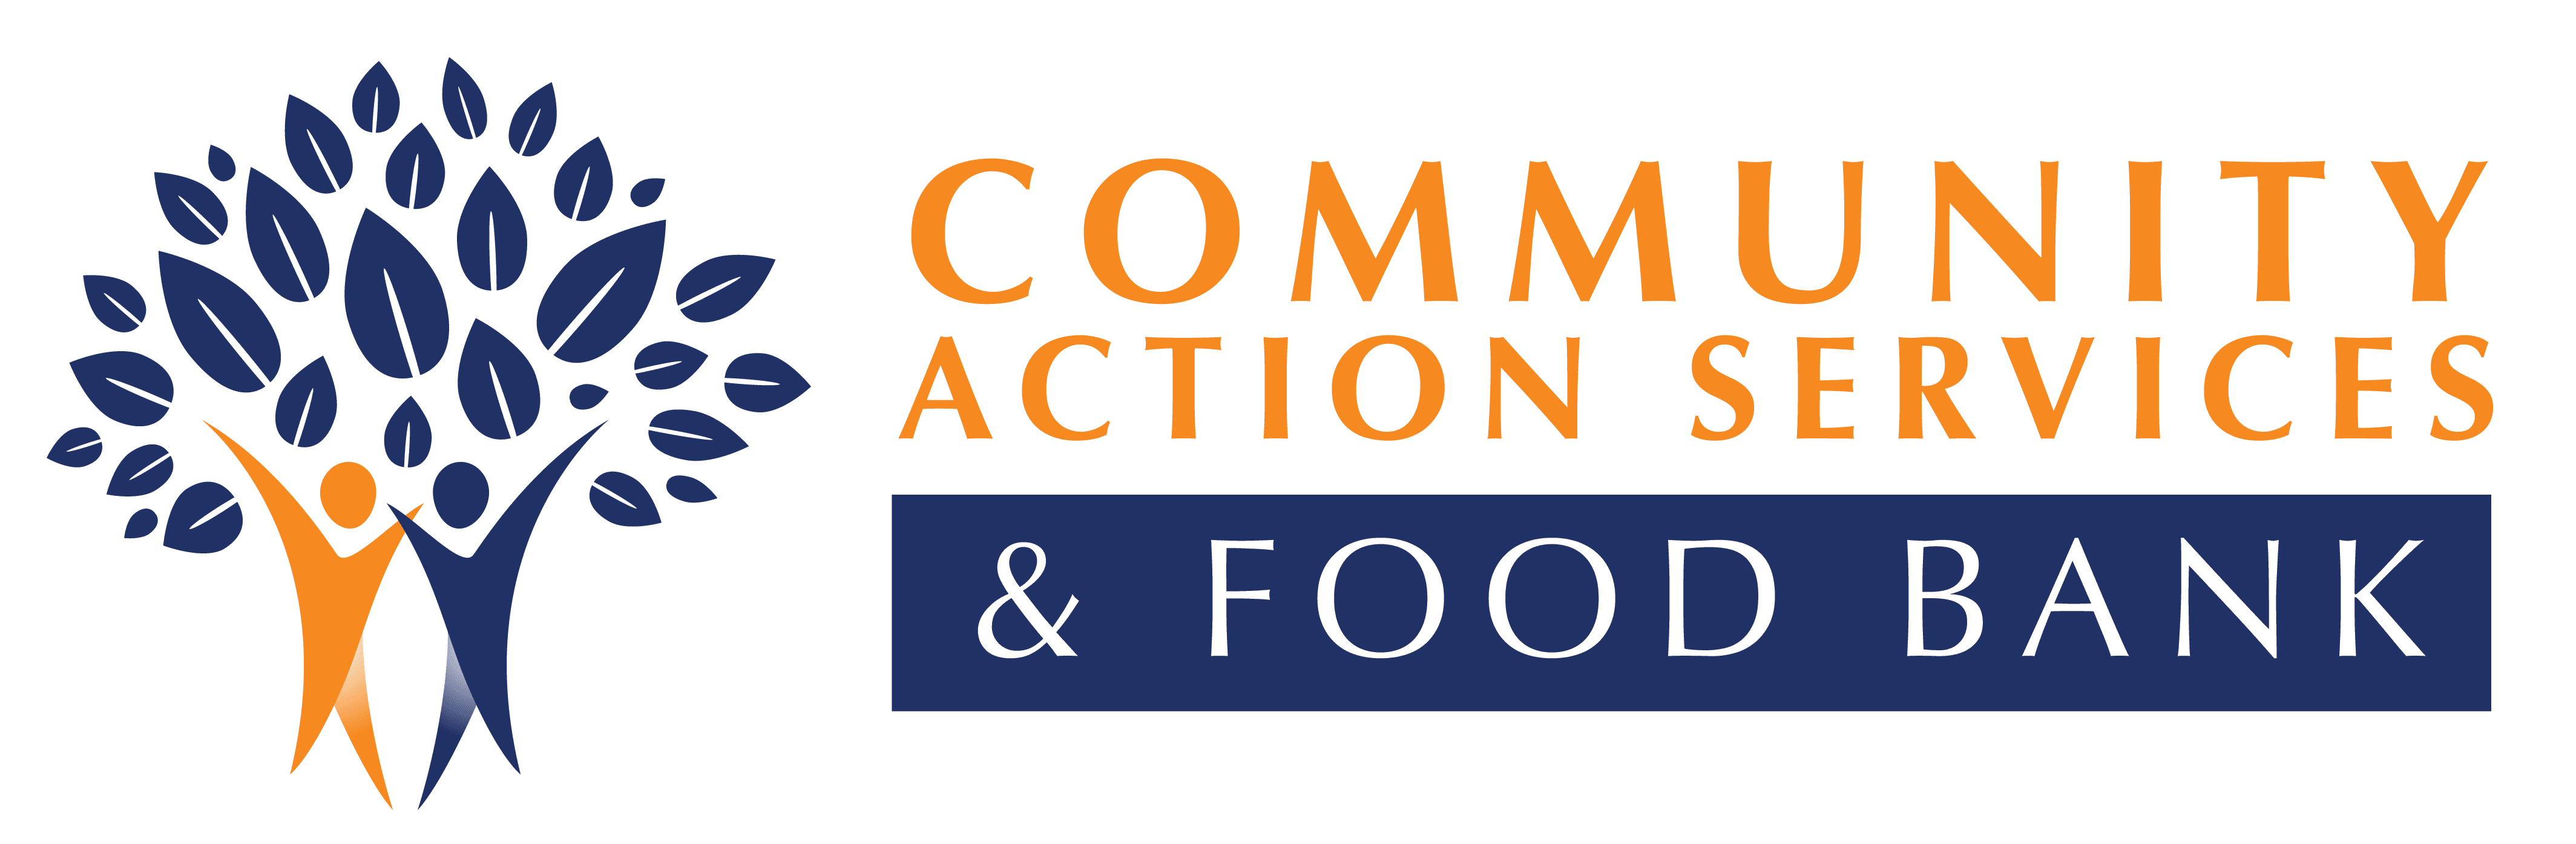 Community Action Services